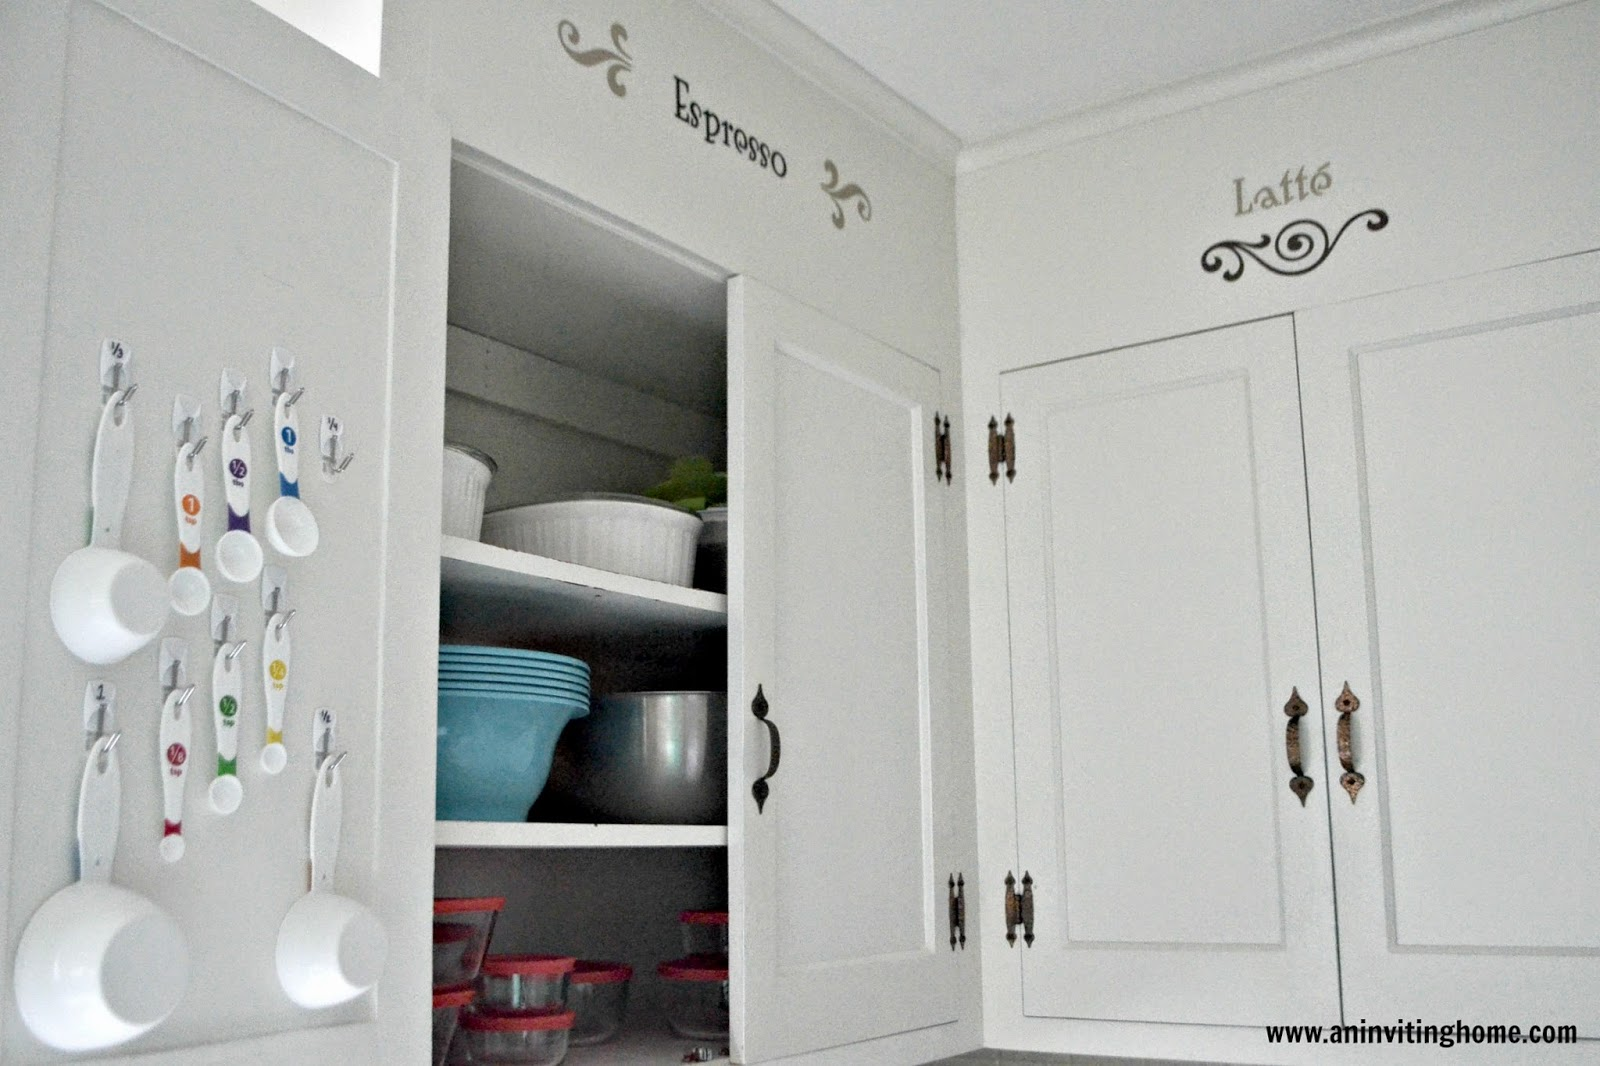 hang measuring cups and spoons on back of cupboard door